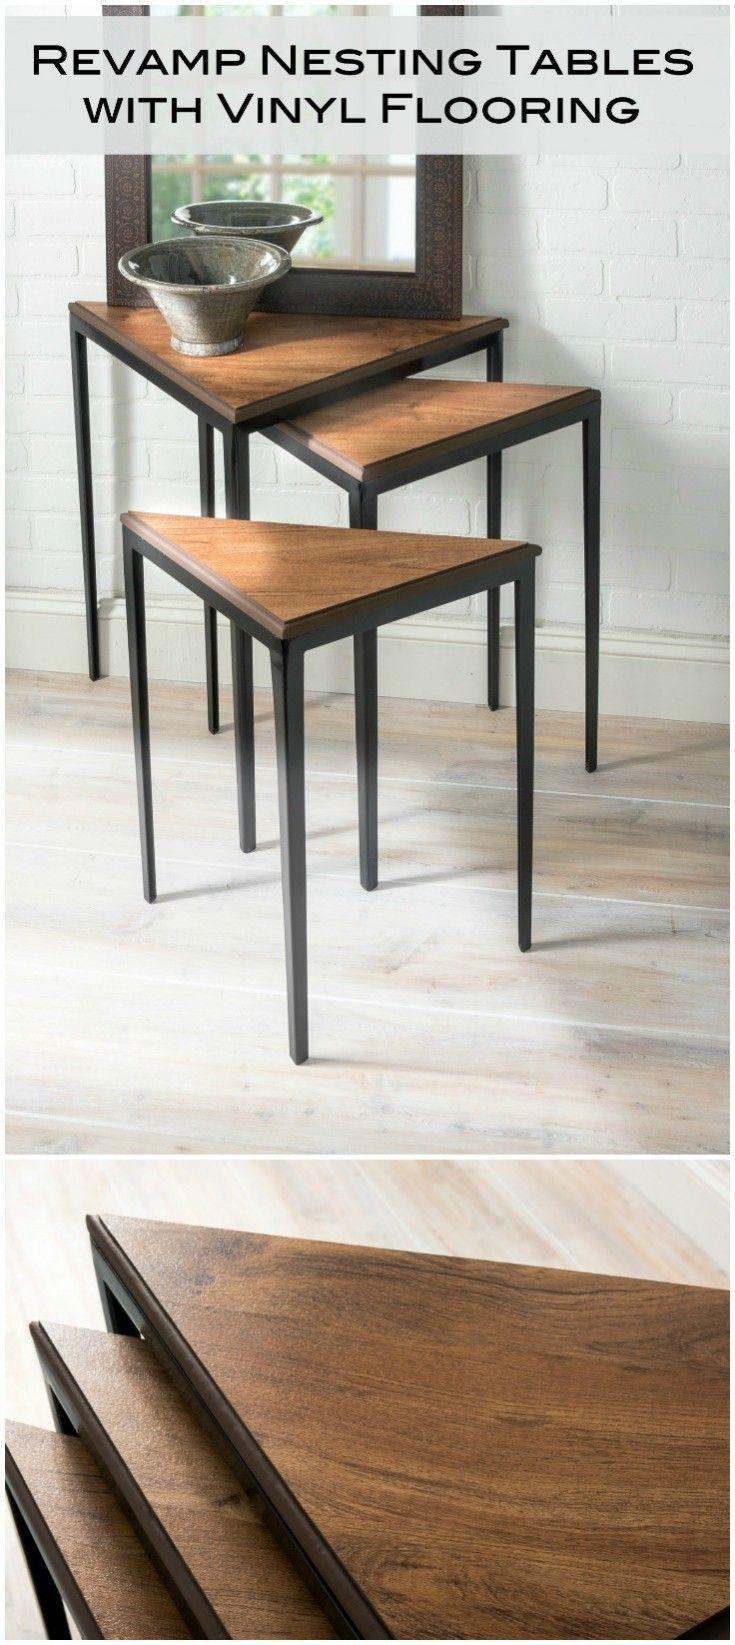 Revamp Nesting Tables with Vinyl Flooring